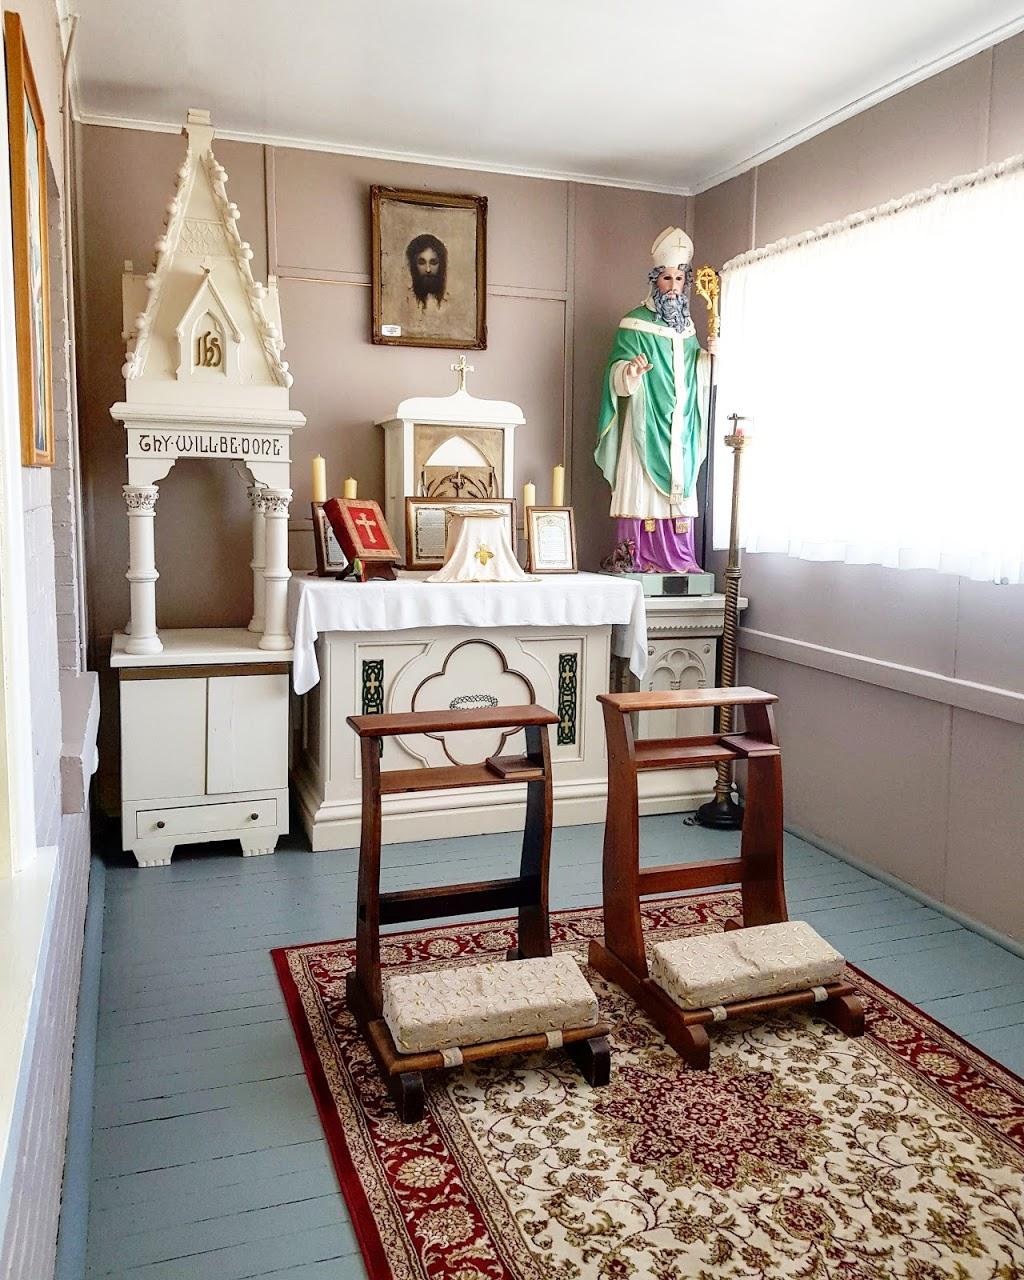 The John OBrien Heritage Museum | museum | 62 Audley St, Narrandera NSW 2700, Australia | 0269592080 OR +61 2 6959 2080